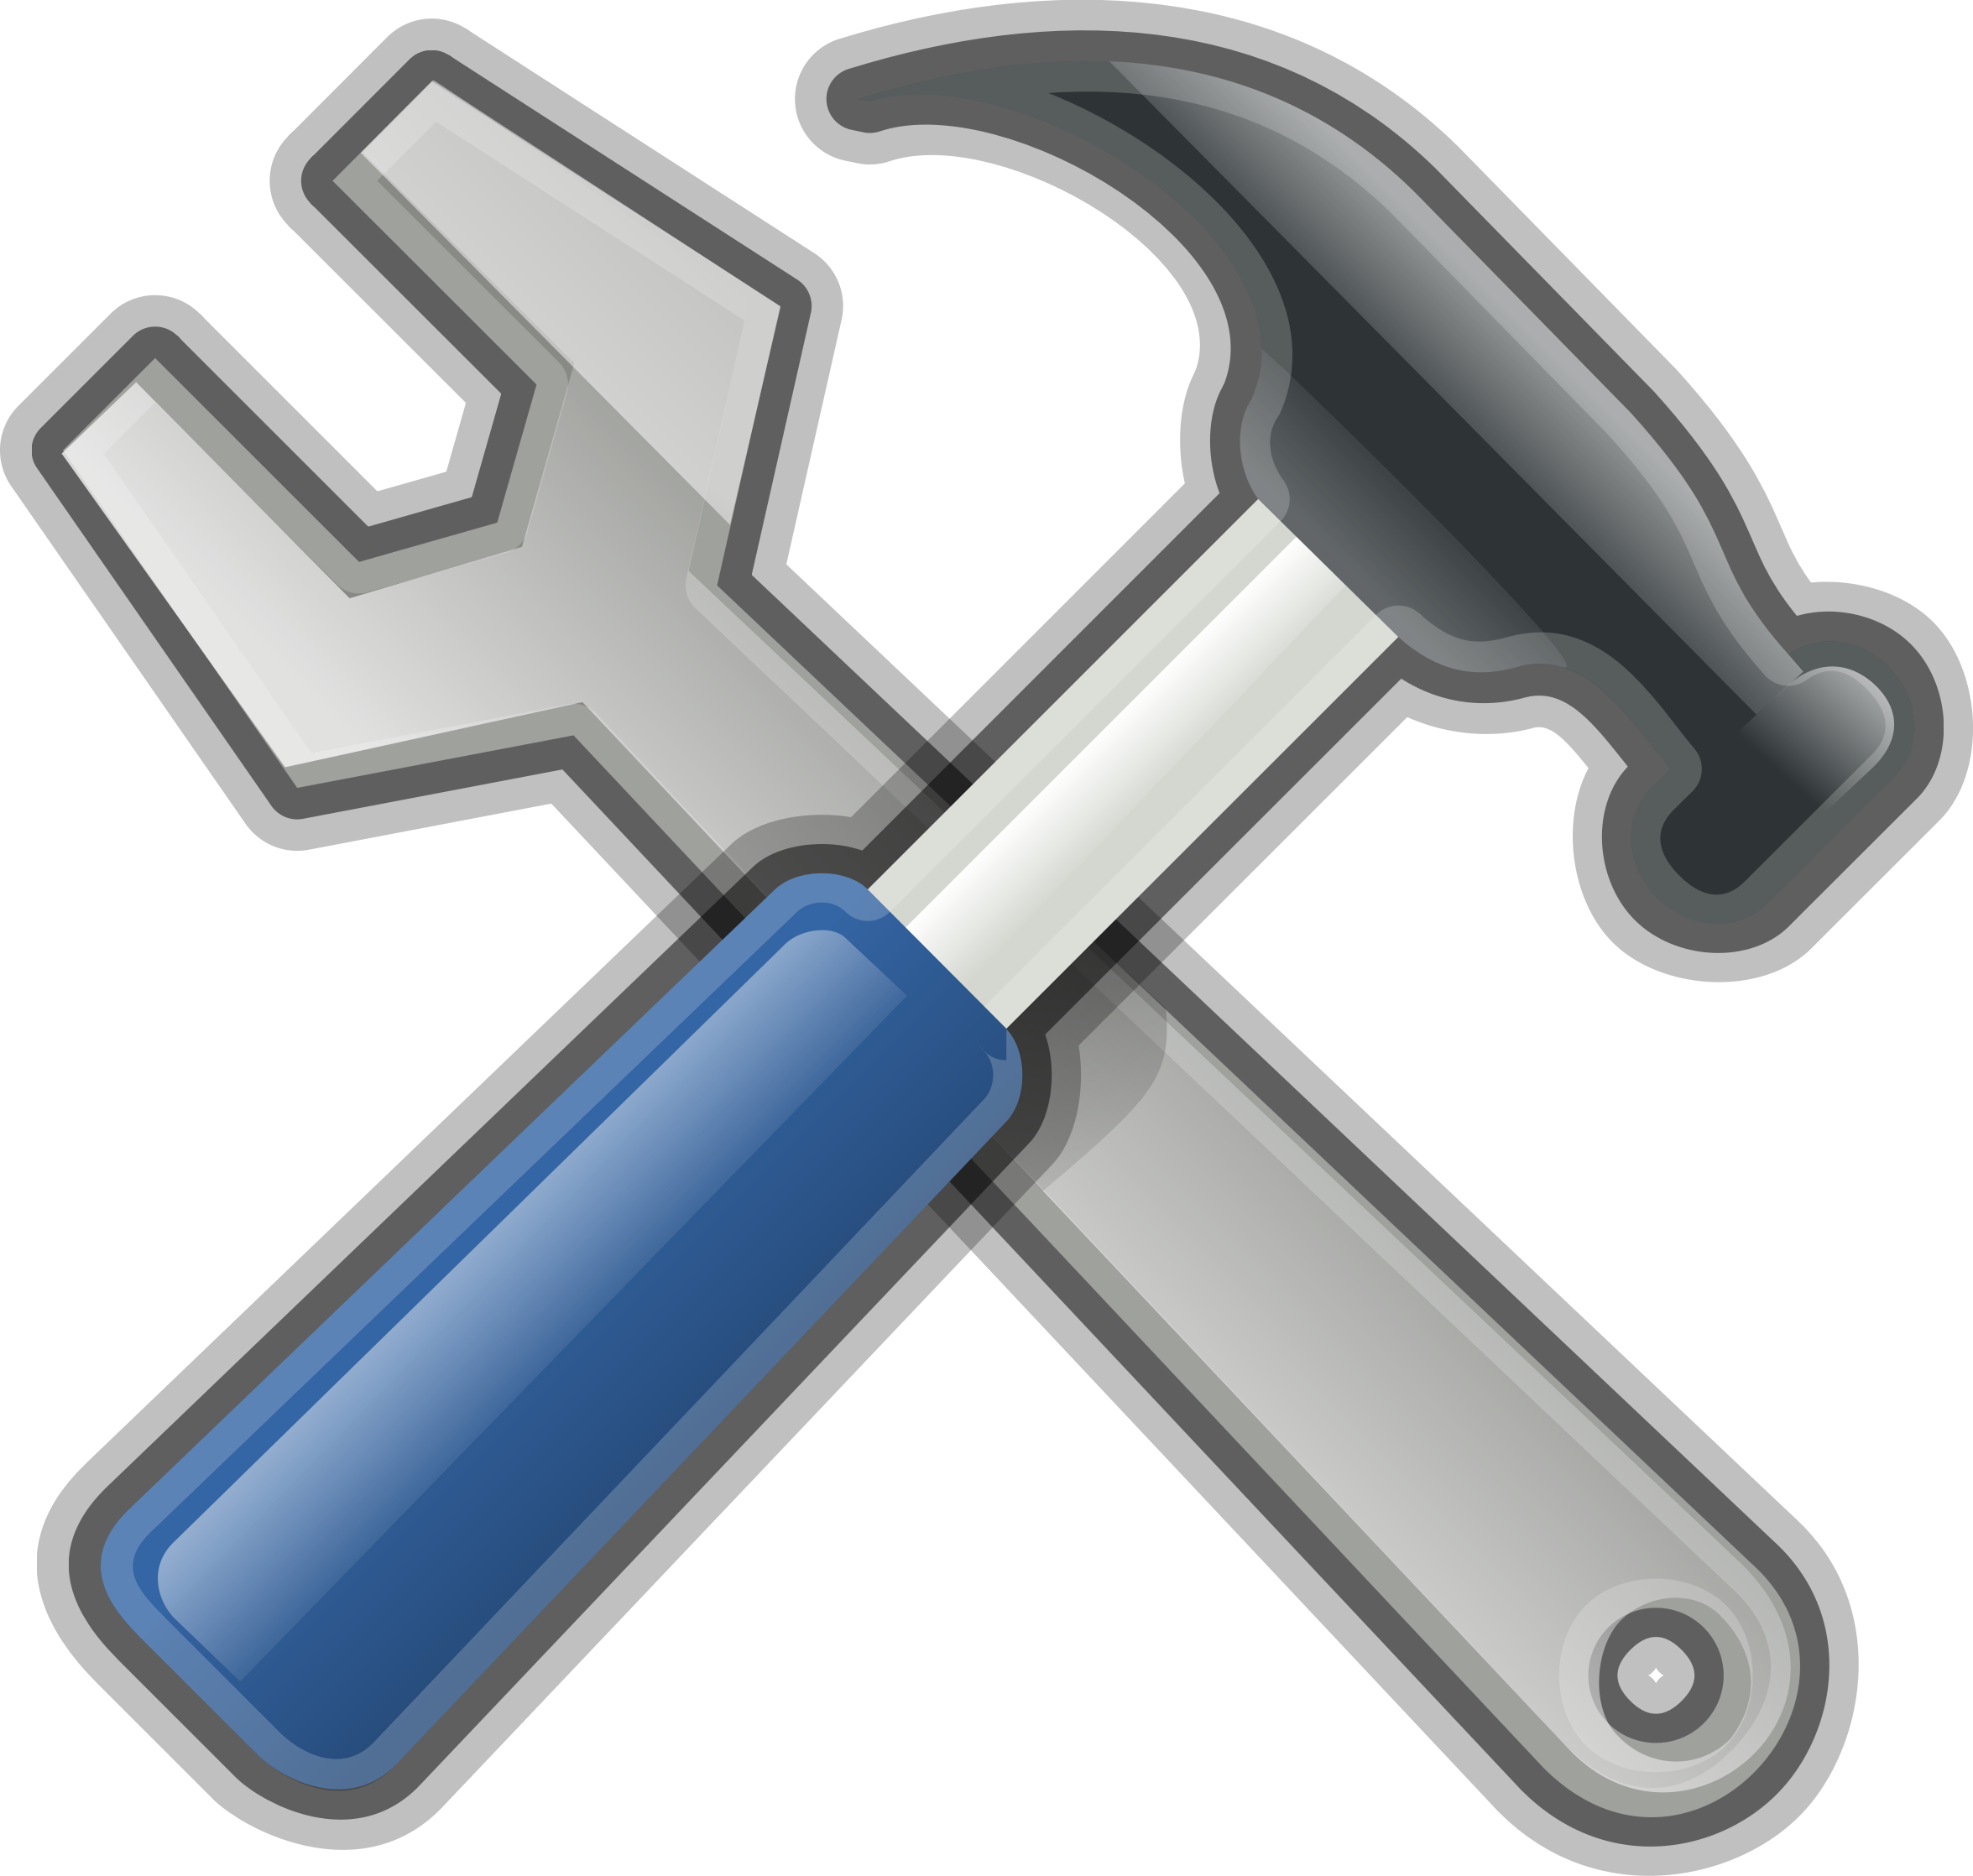 Hammer clipart hammer screwdriver. Tools spanner big image